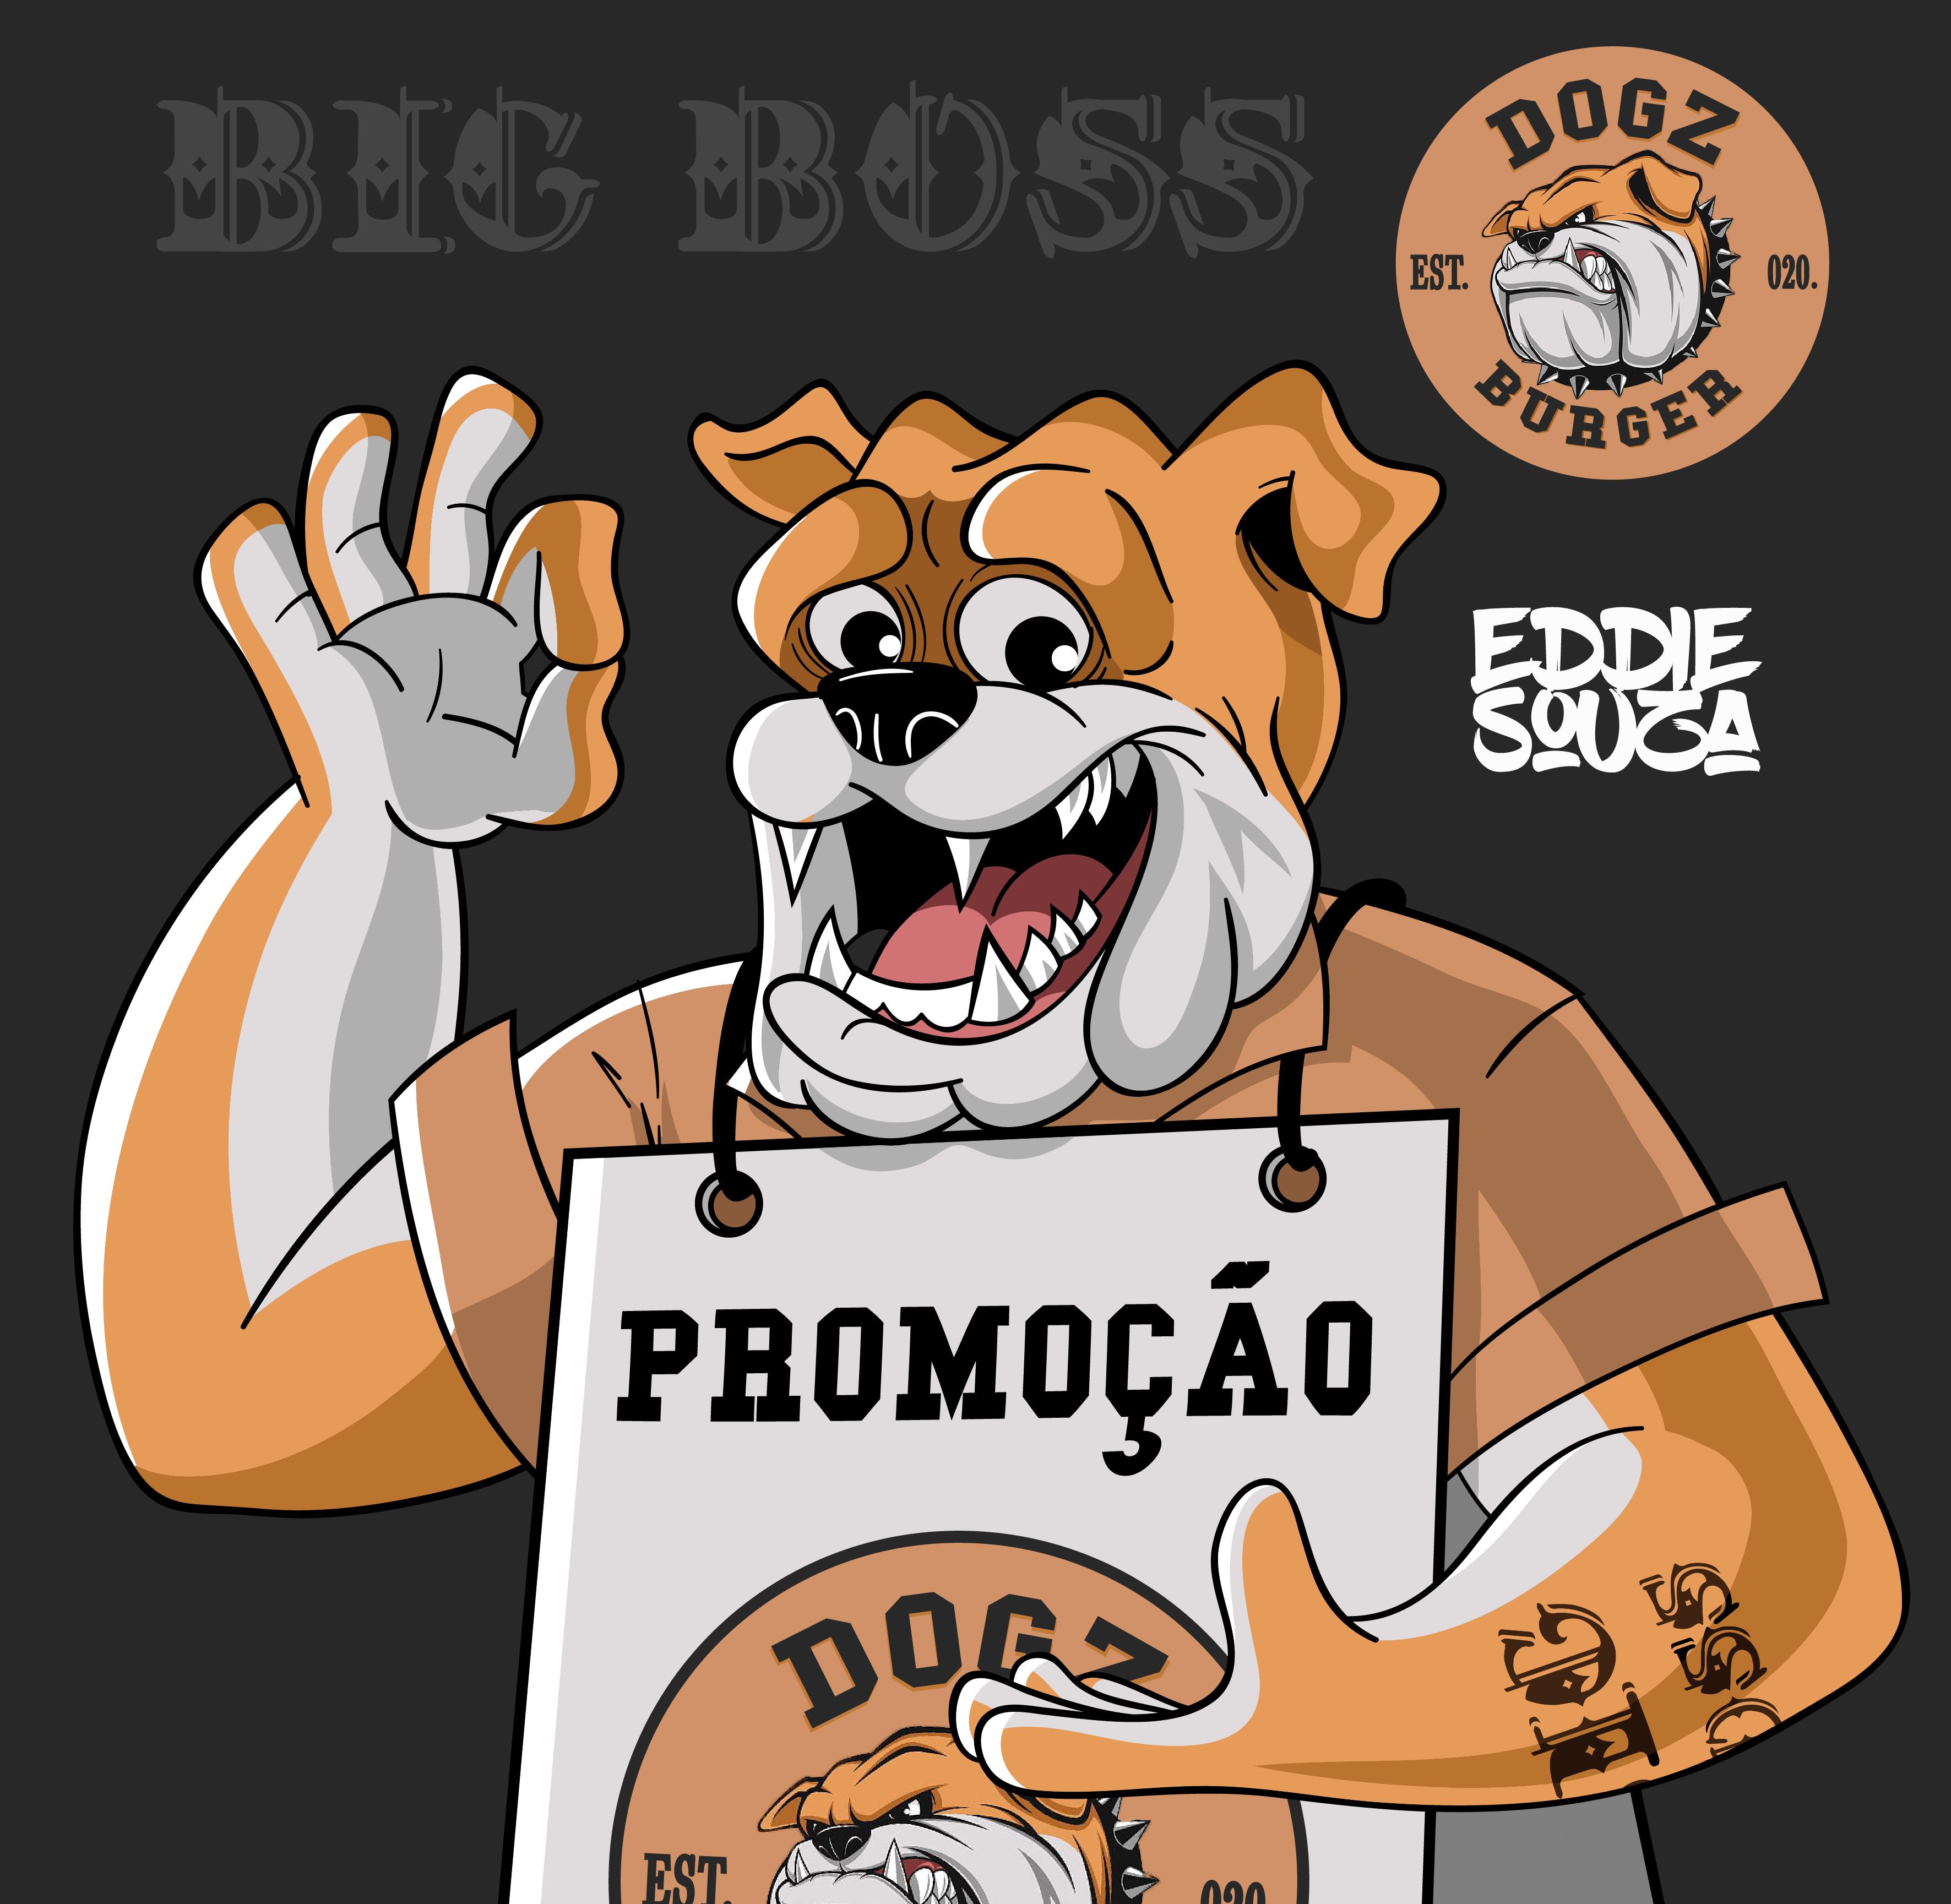 Big Boss - Dogz Burger